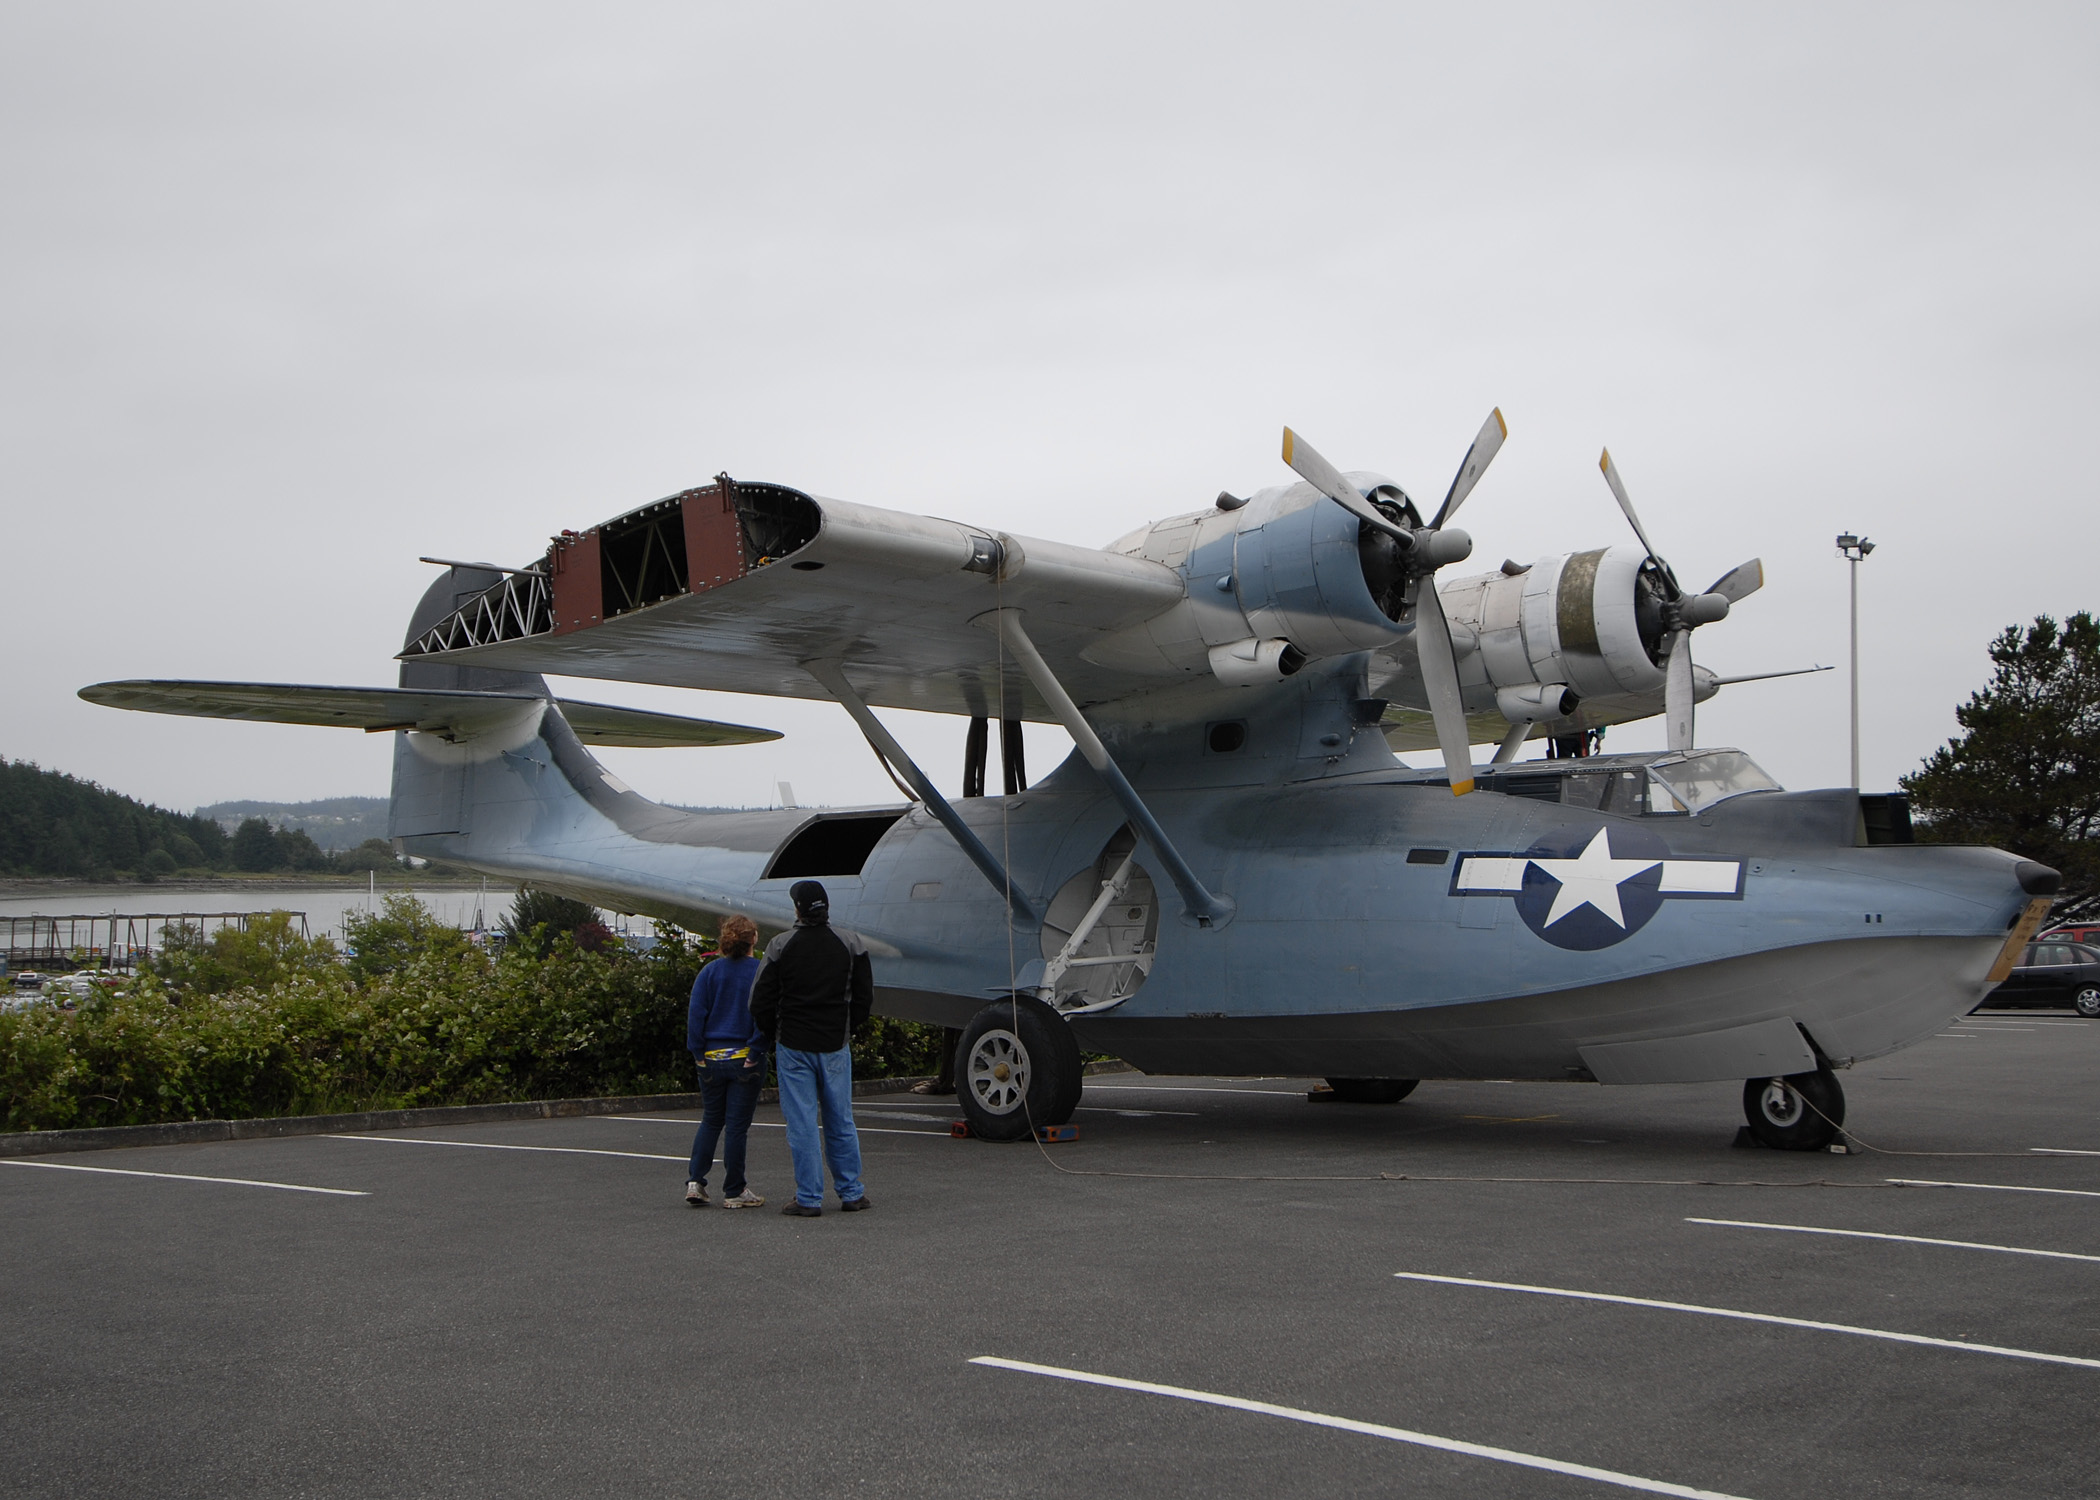 World war ii era pby 5a seaplane at simard hall at the naval air